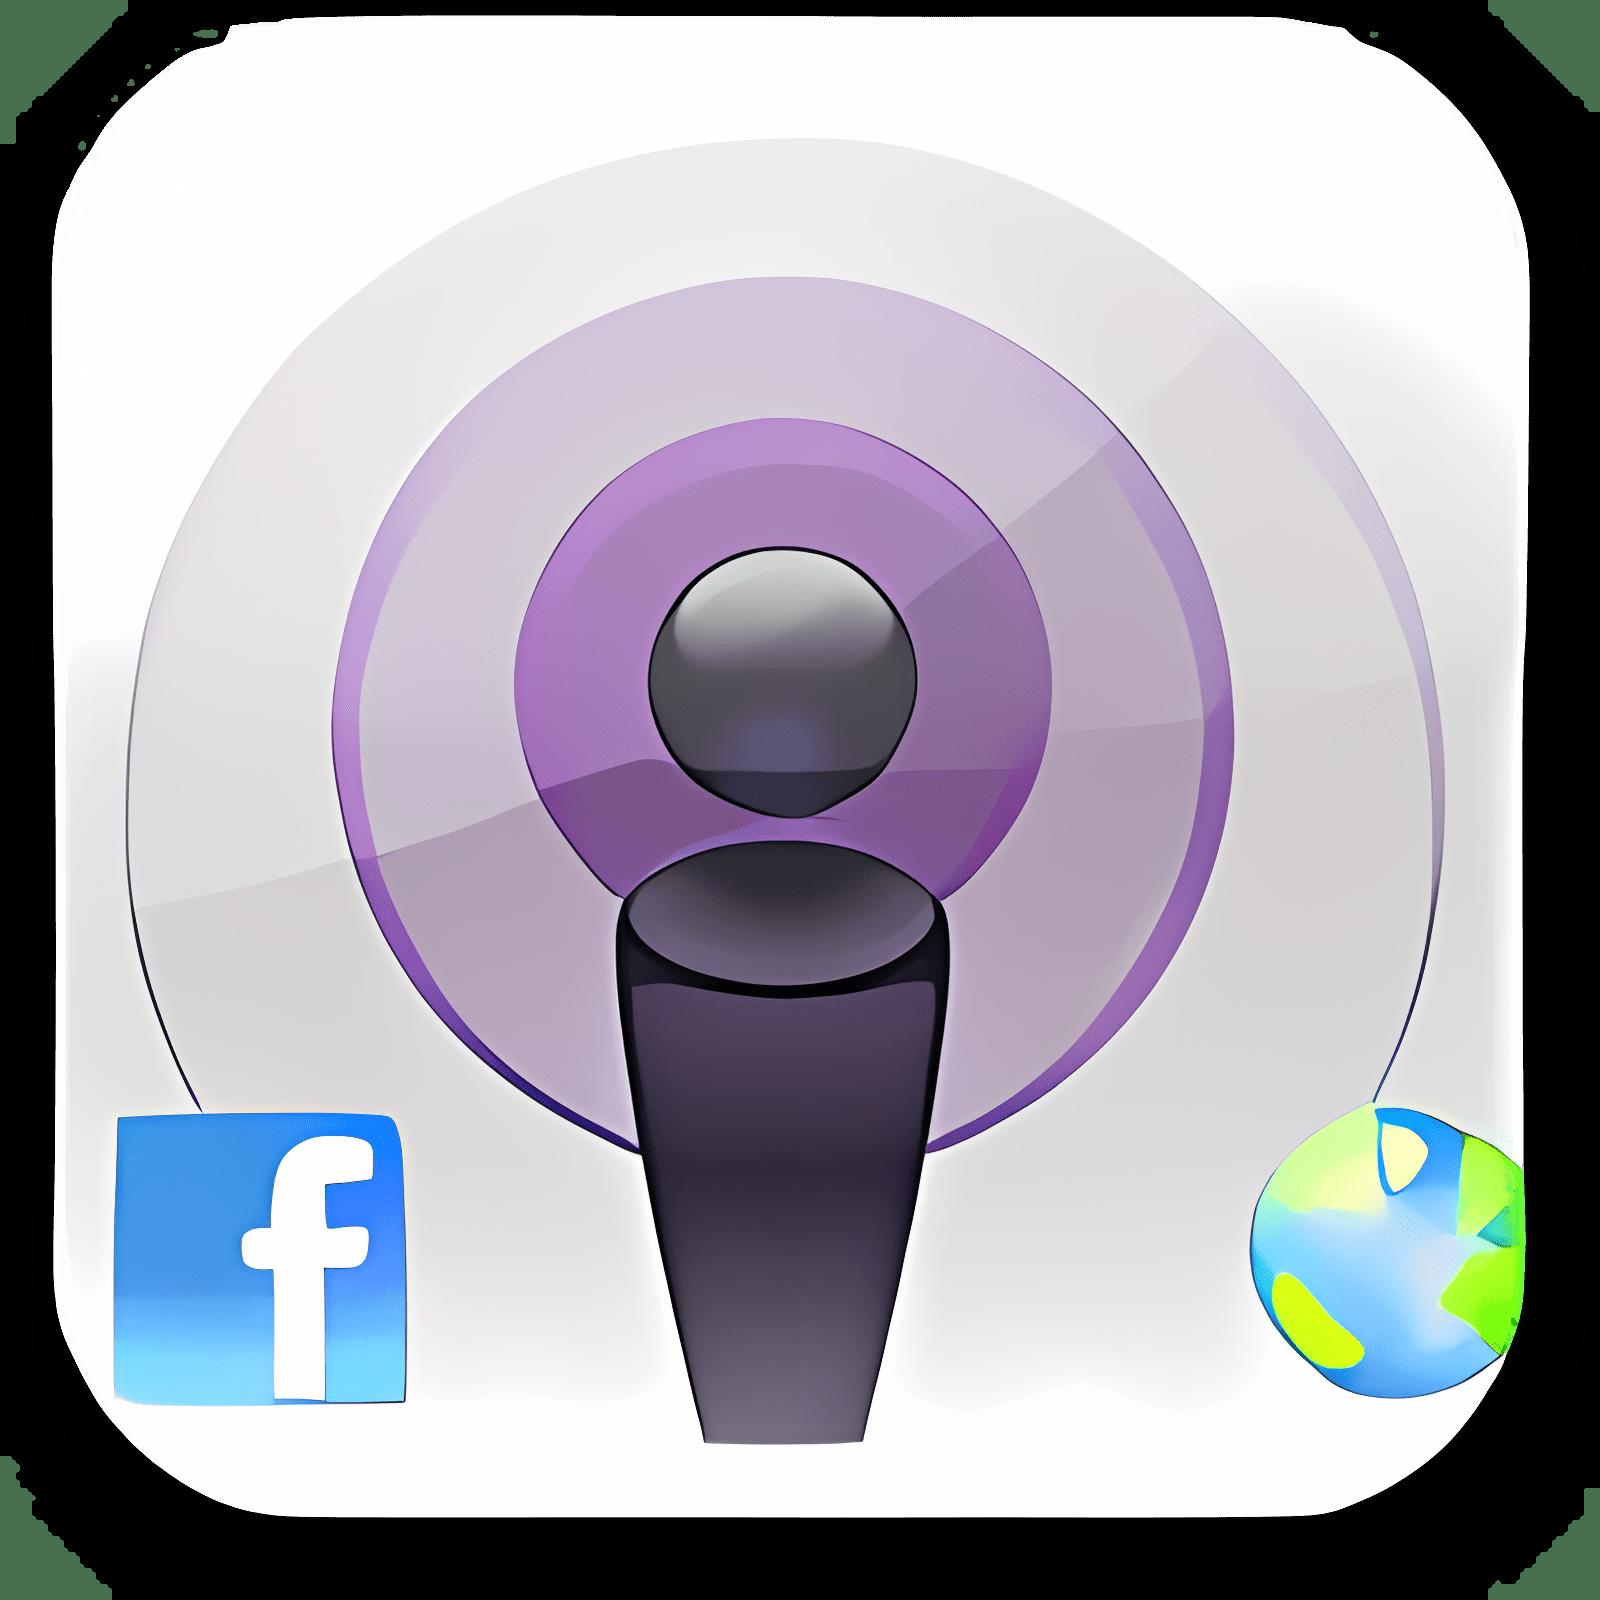 Social Web Buttons